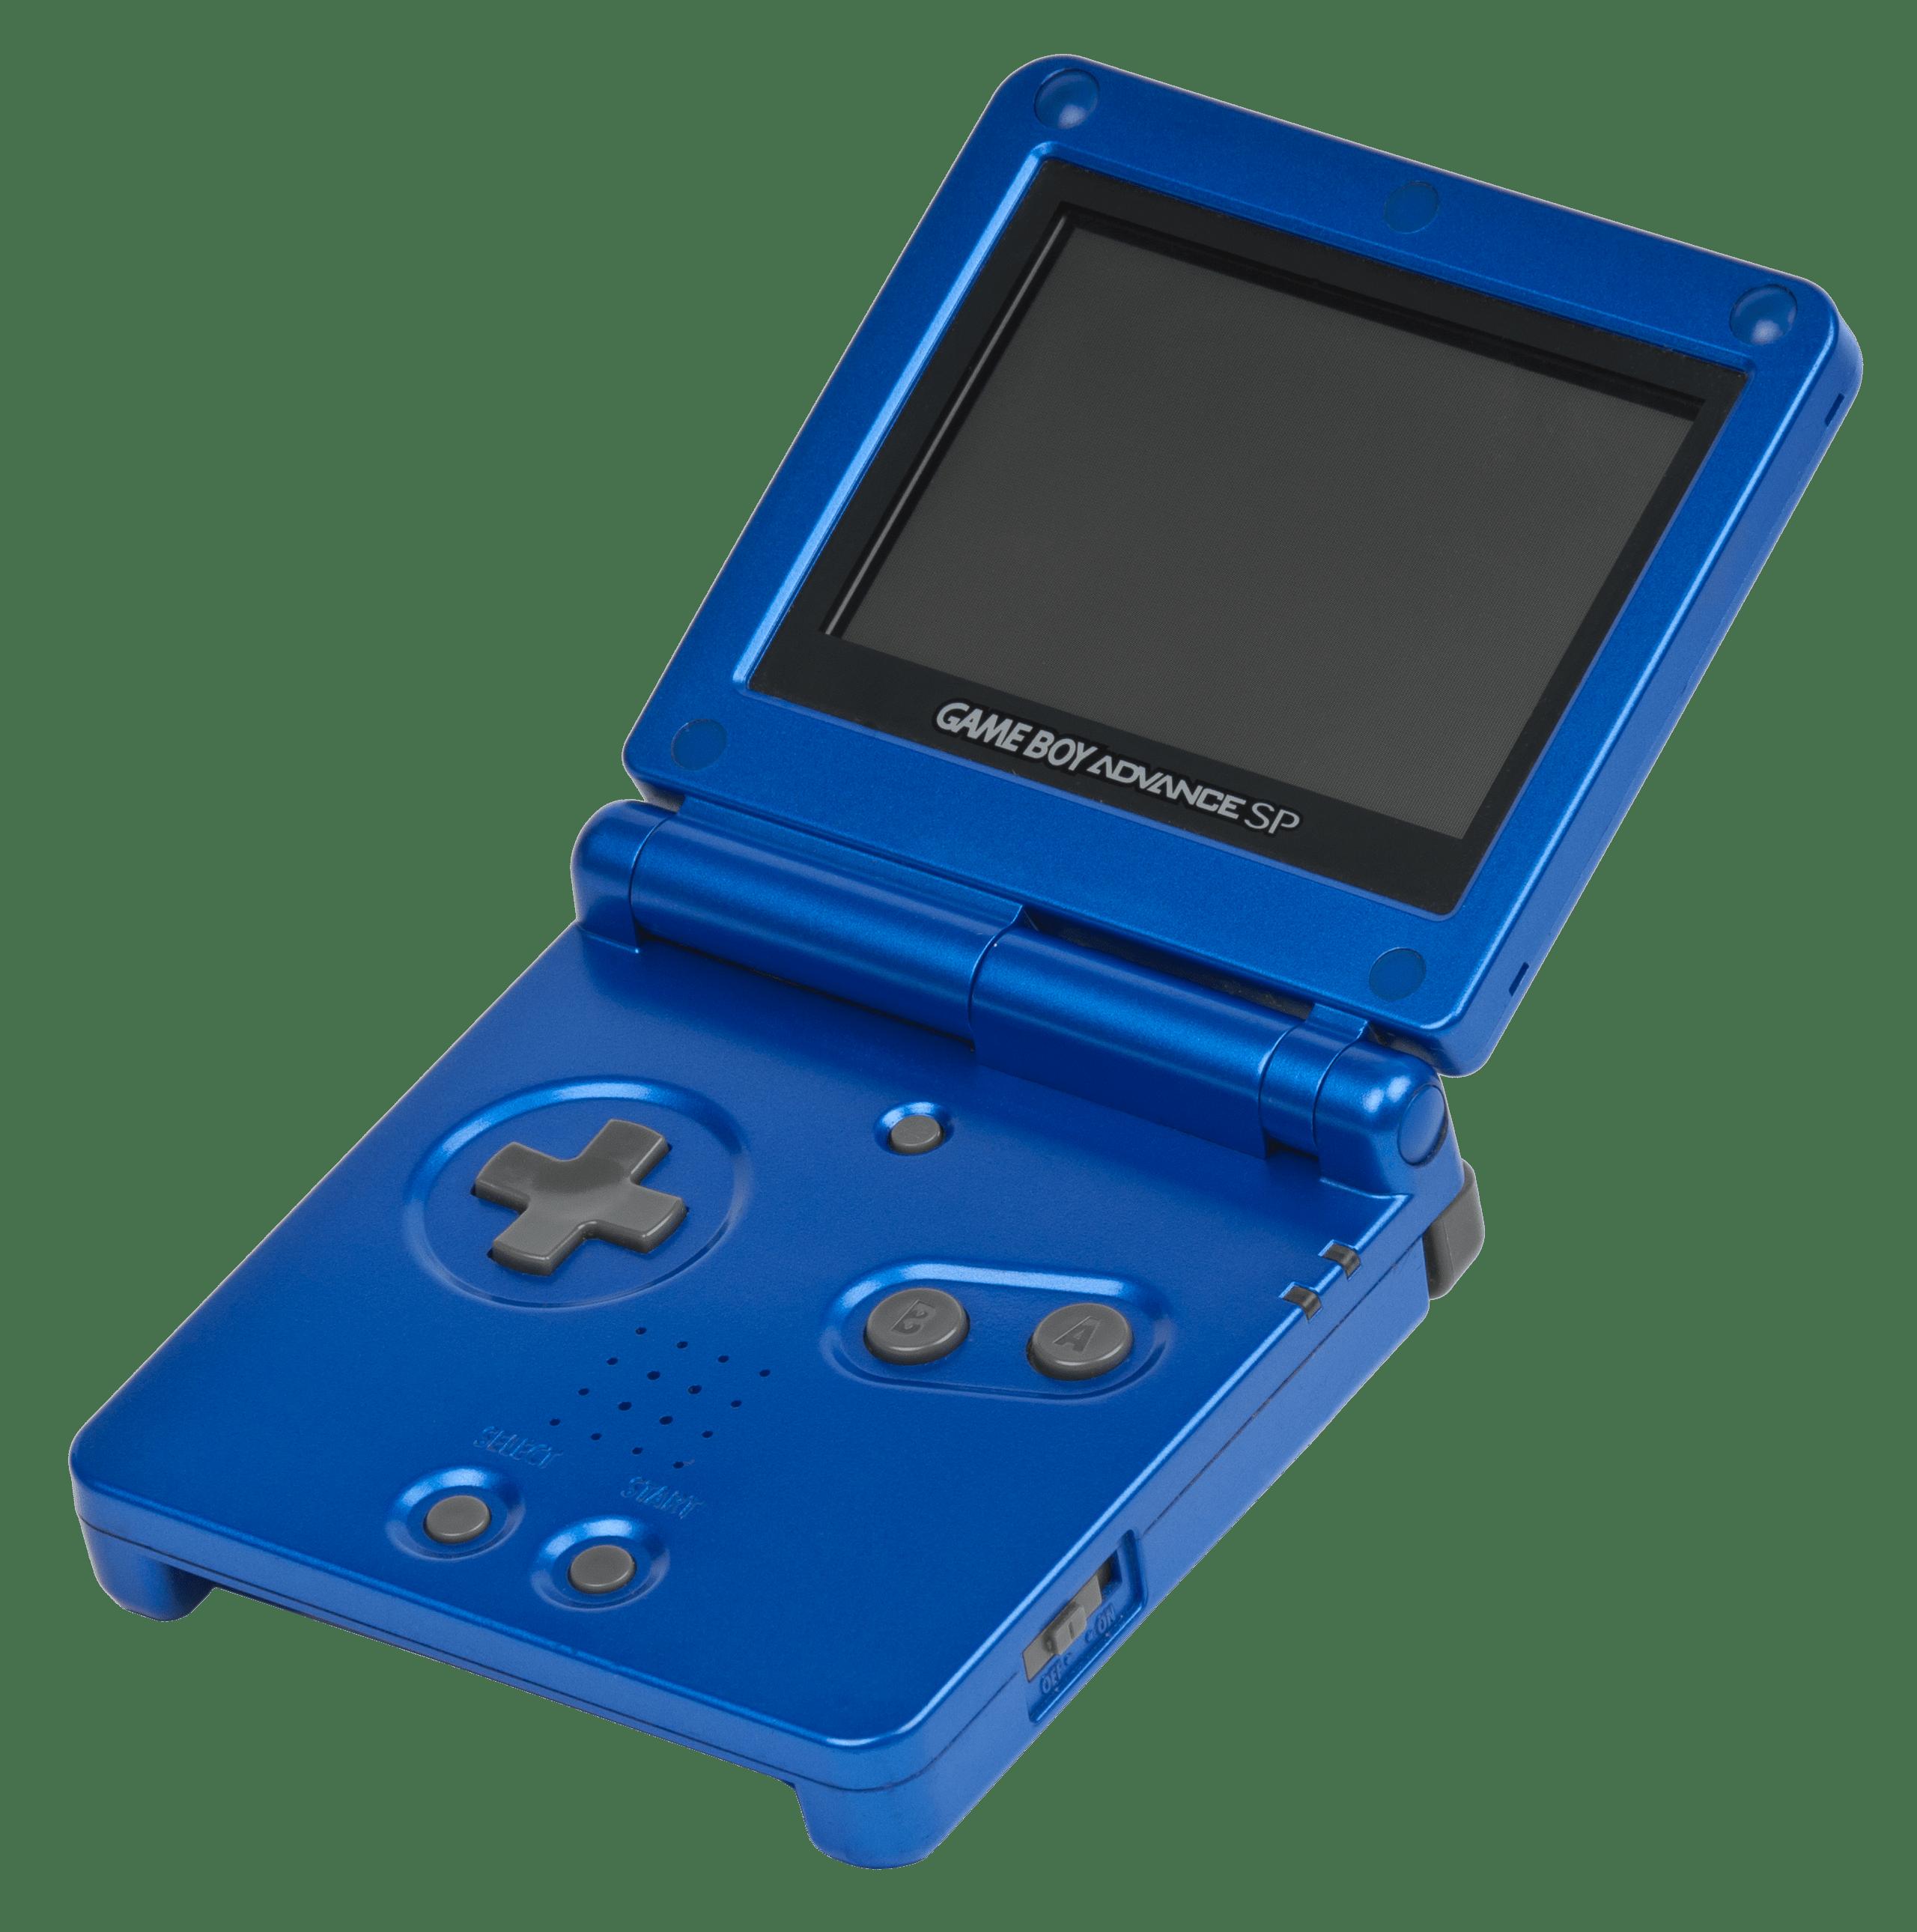 Game clipart gameboy. Nintendo boy advance sp